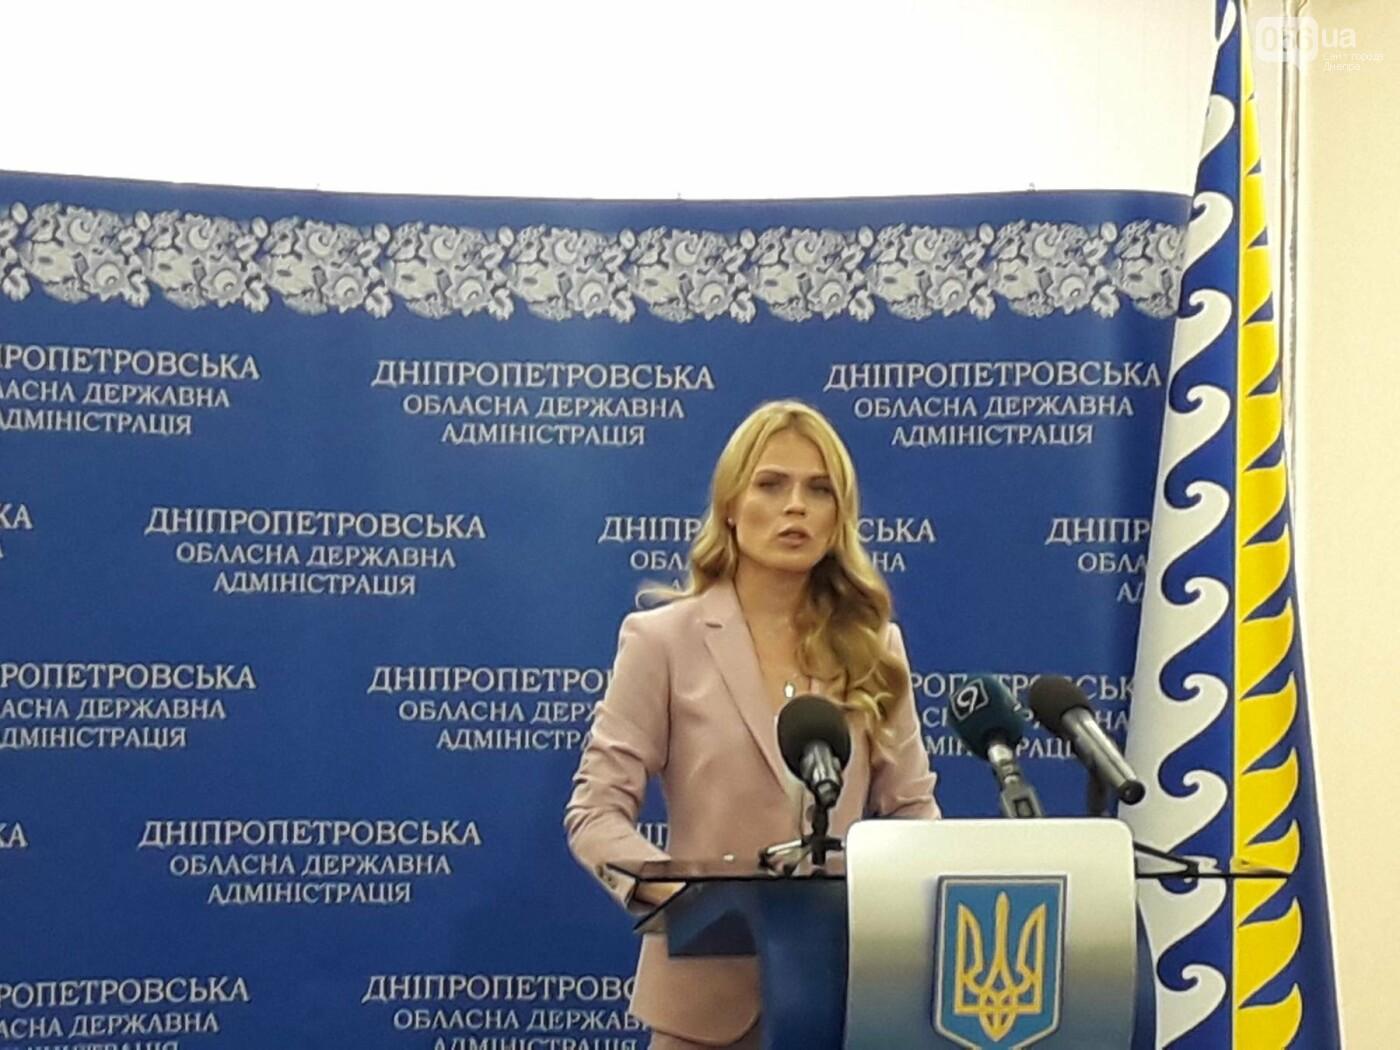 В Днепре Ольга Фреймут презентовала книгу для детей,  - ФОТО, фото-1